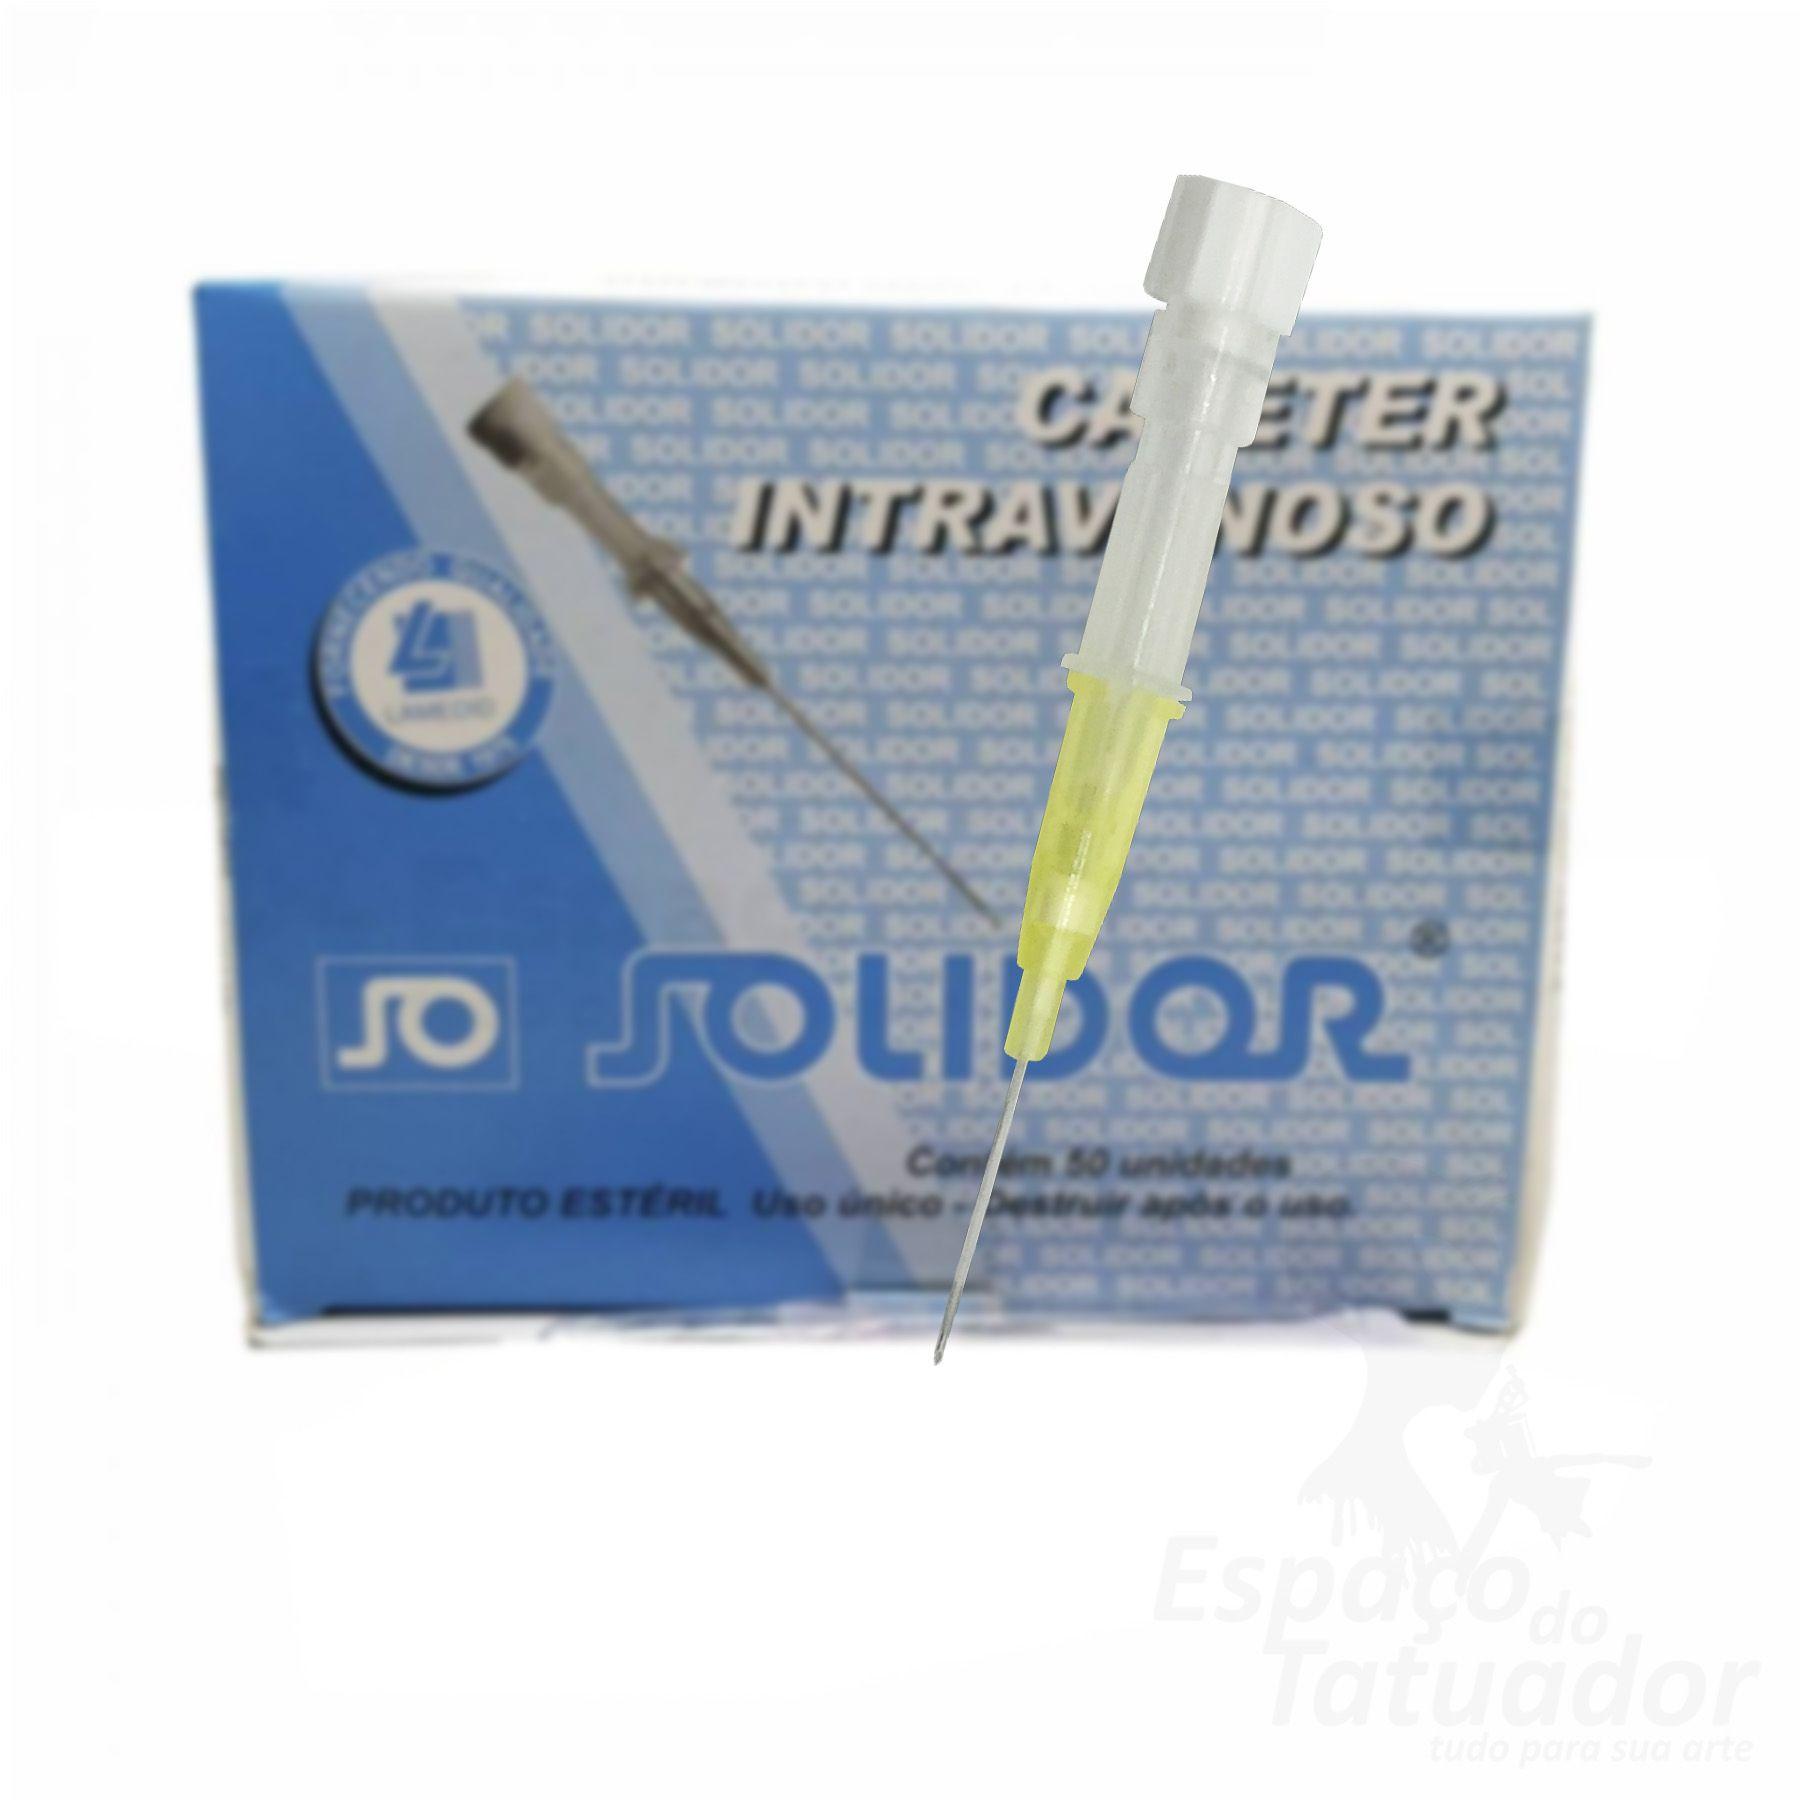 Cateter Intravenoso Solidor - 24G - Unidade